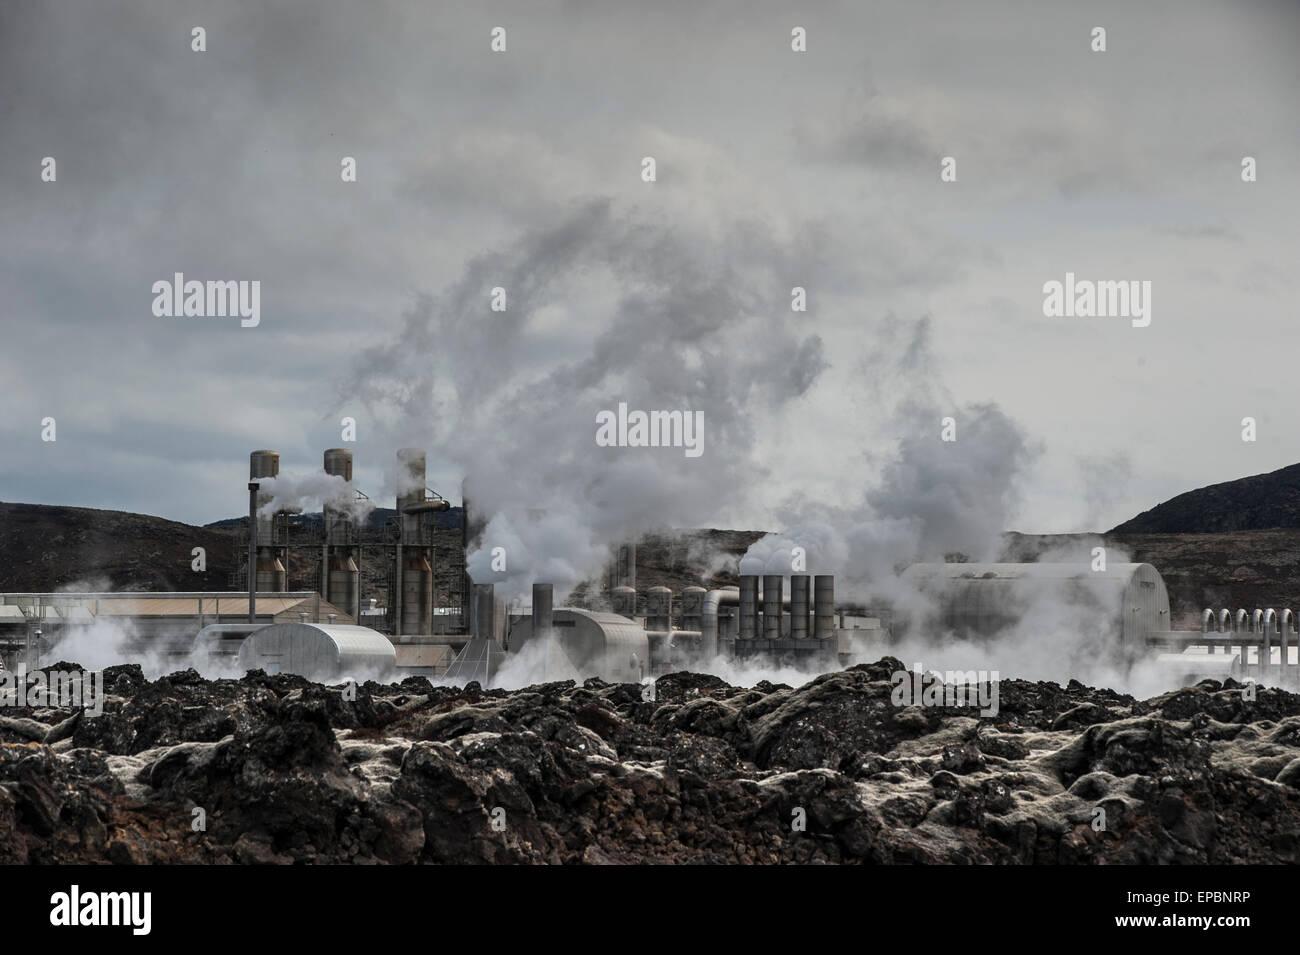 Impianto di energia geotermica in Islanda Immagini Stock